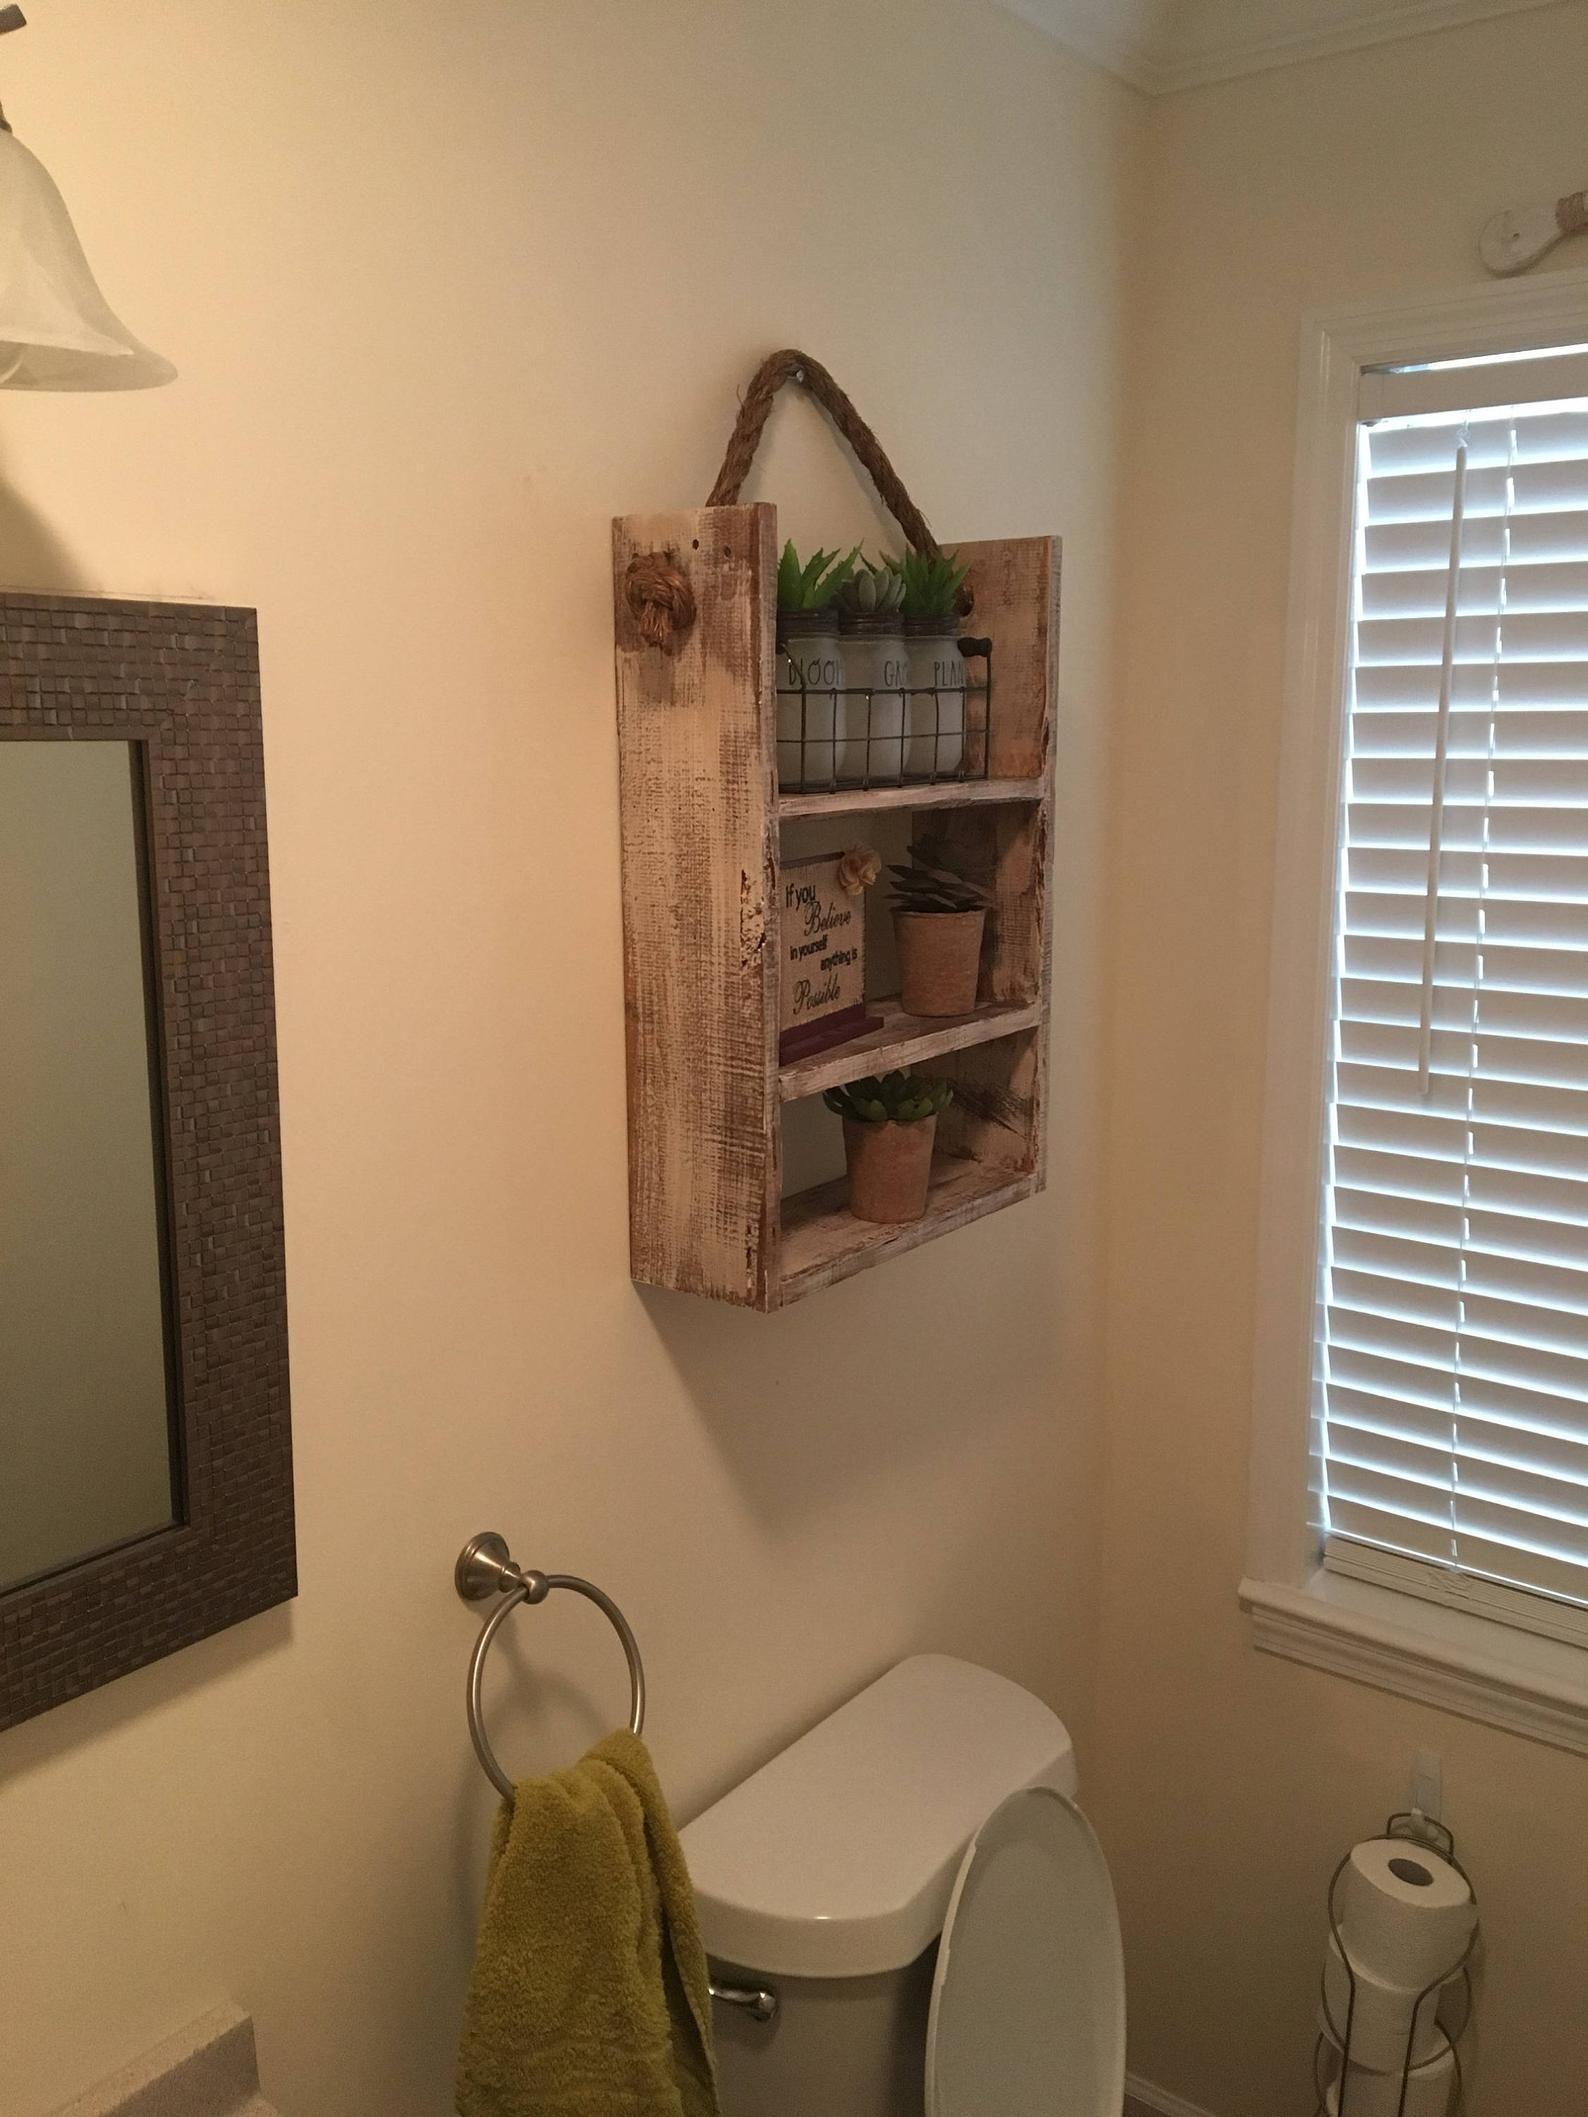 3 tier rustic bathroom shelf decor farmhouse furniture